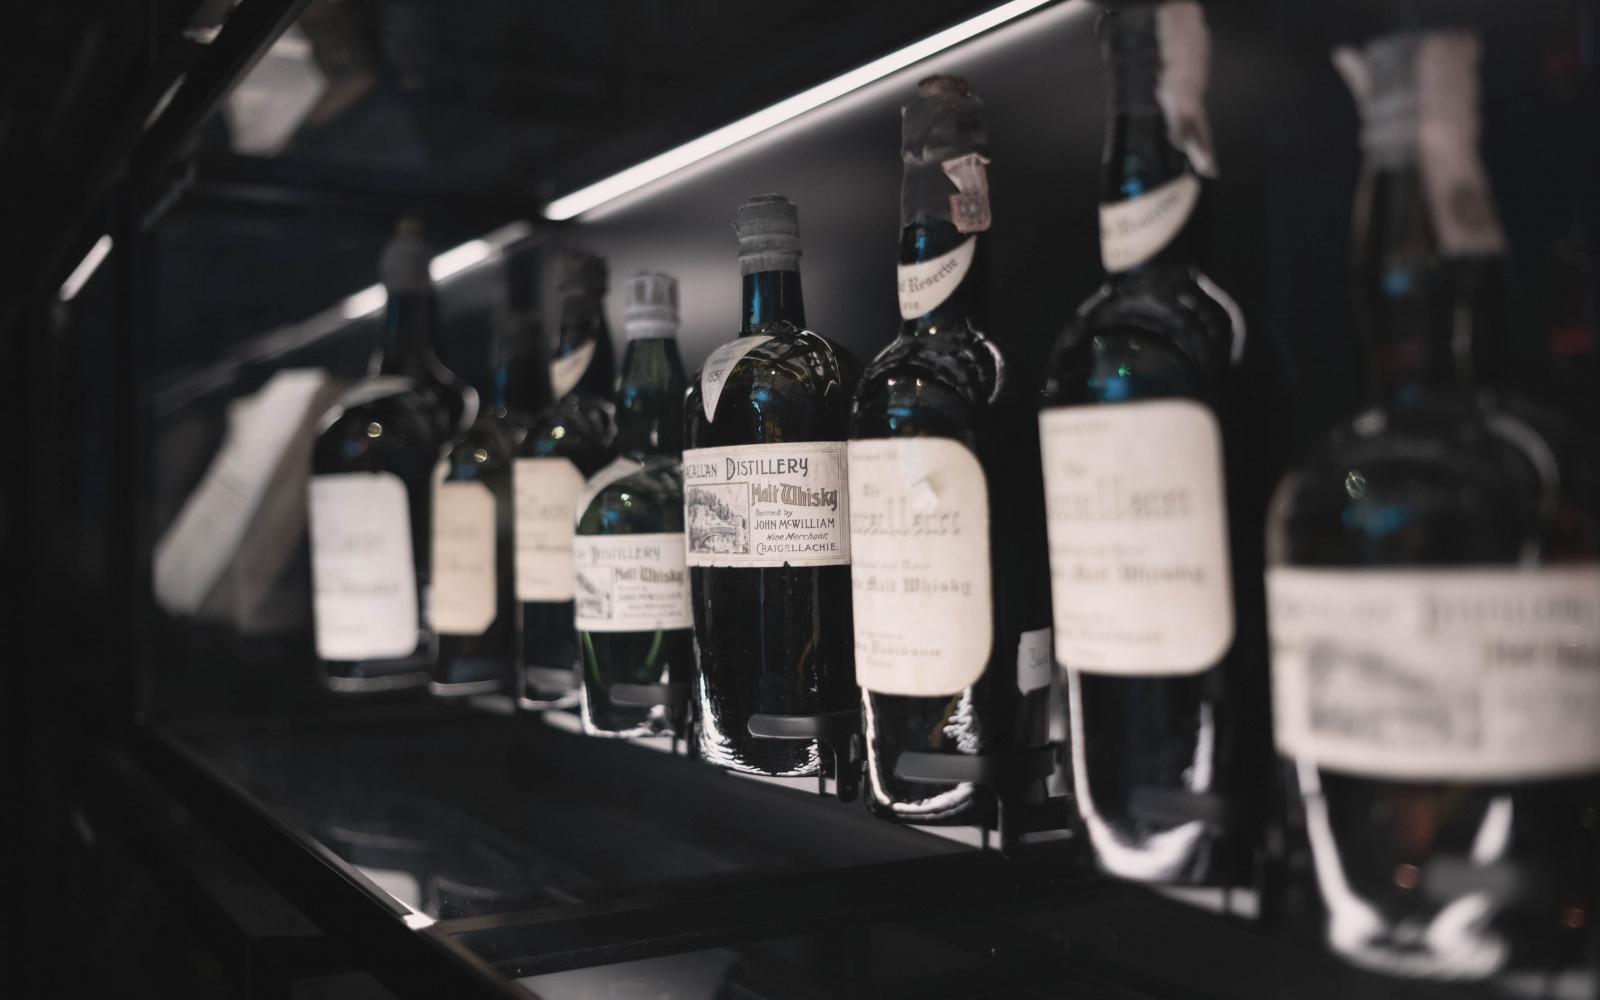 Unopened bottles can last forever